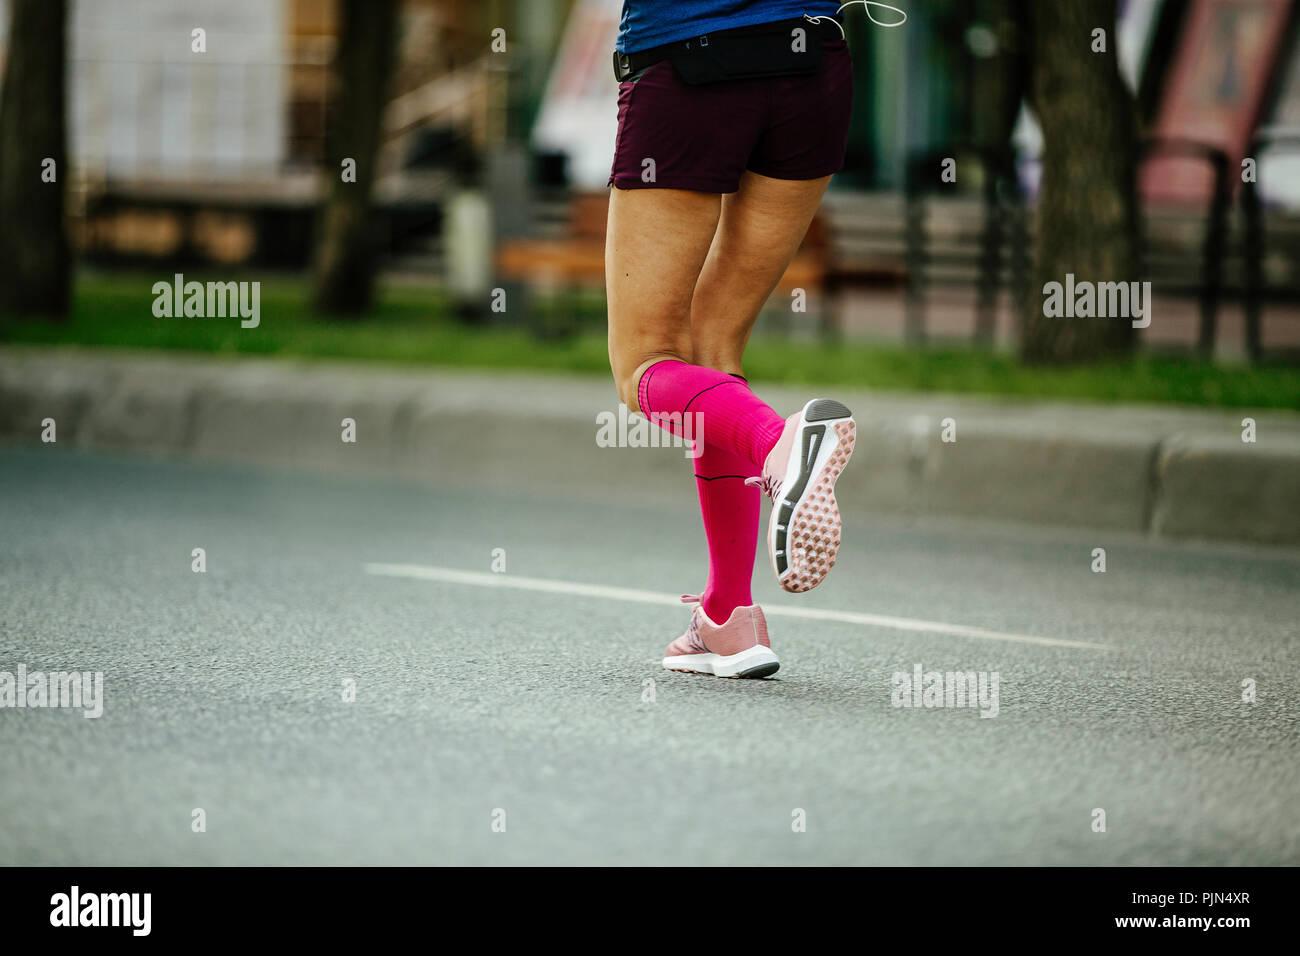 7f64b00b2 Compression Socks Stock Photos   Compression Socks Stock Images - Alamy